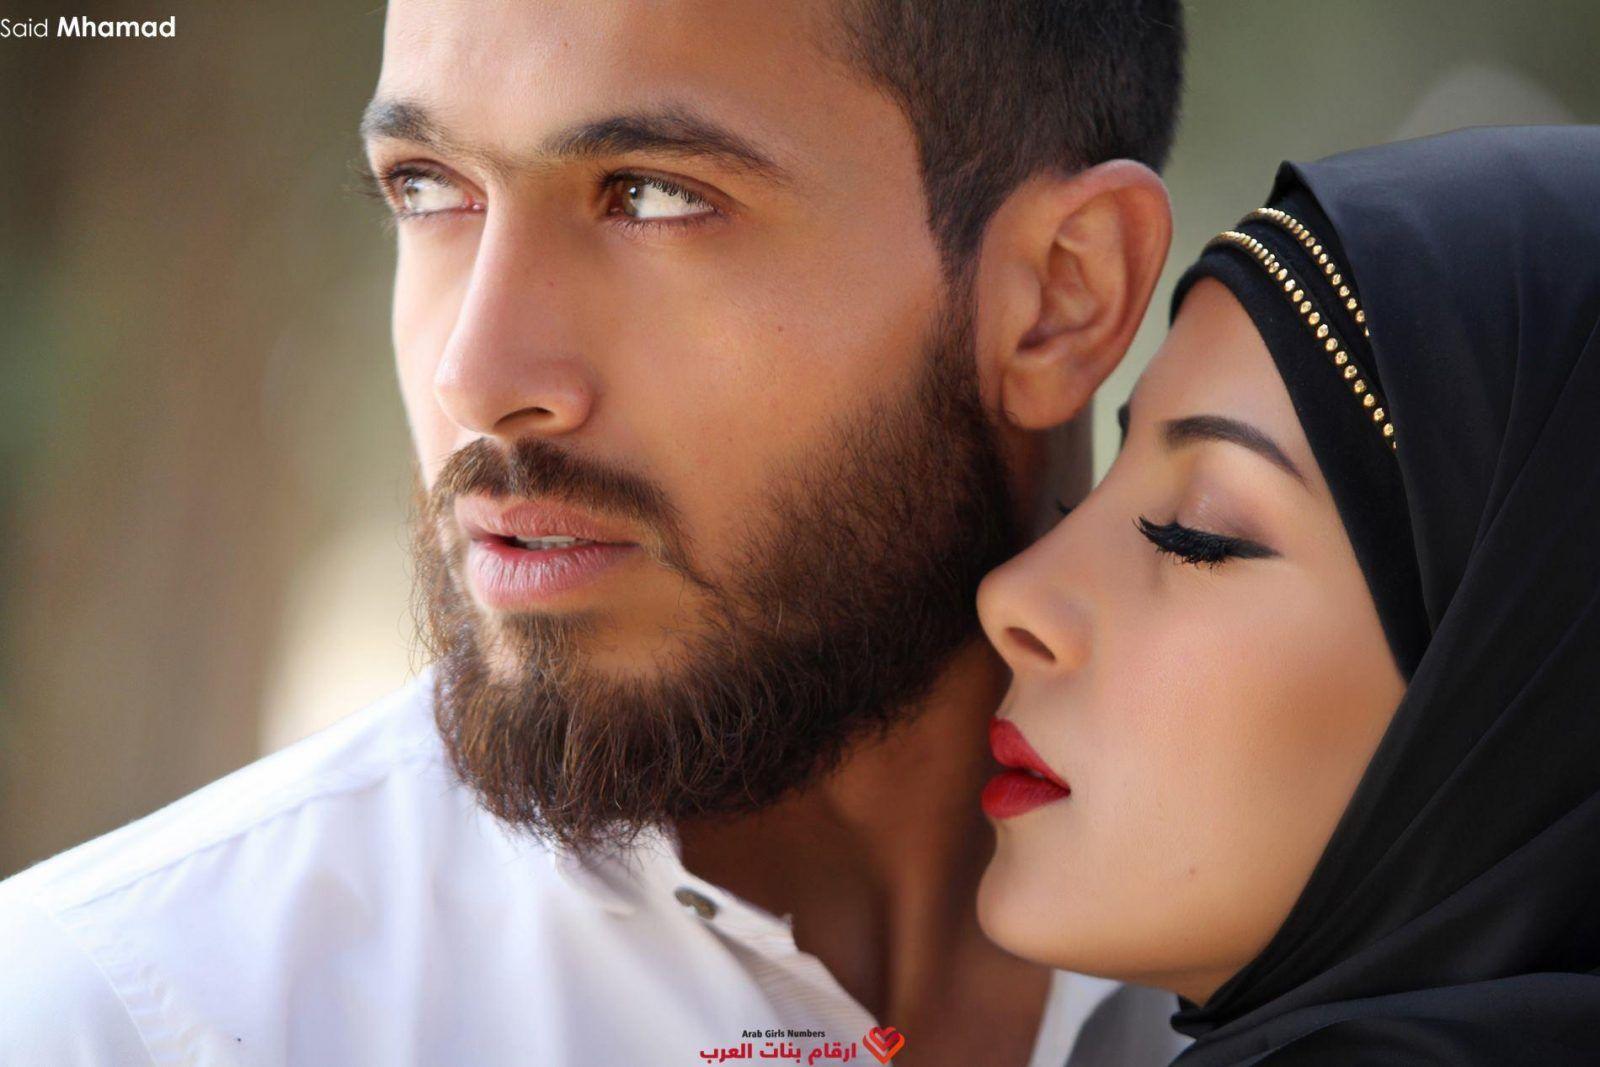 شات بنات اونلاين عرب للتعارف والزواج دردشة 2019 Muslim Couples Muslim Girls Fashion Couple